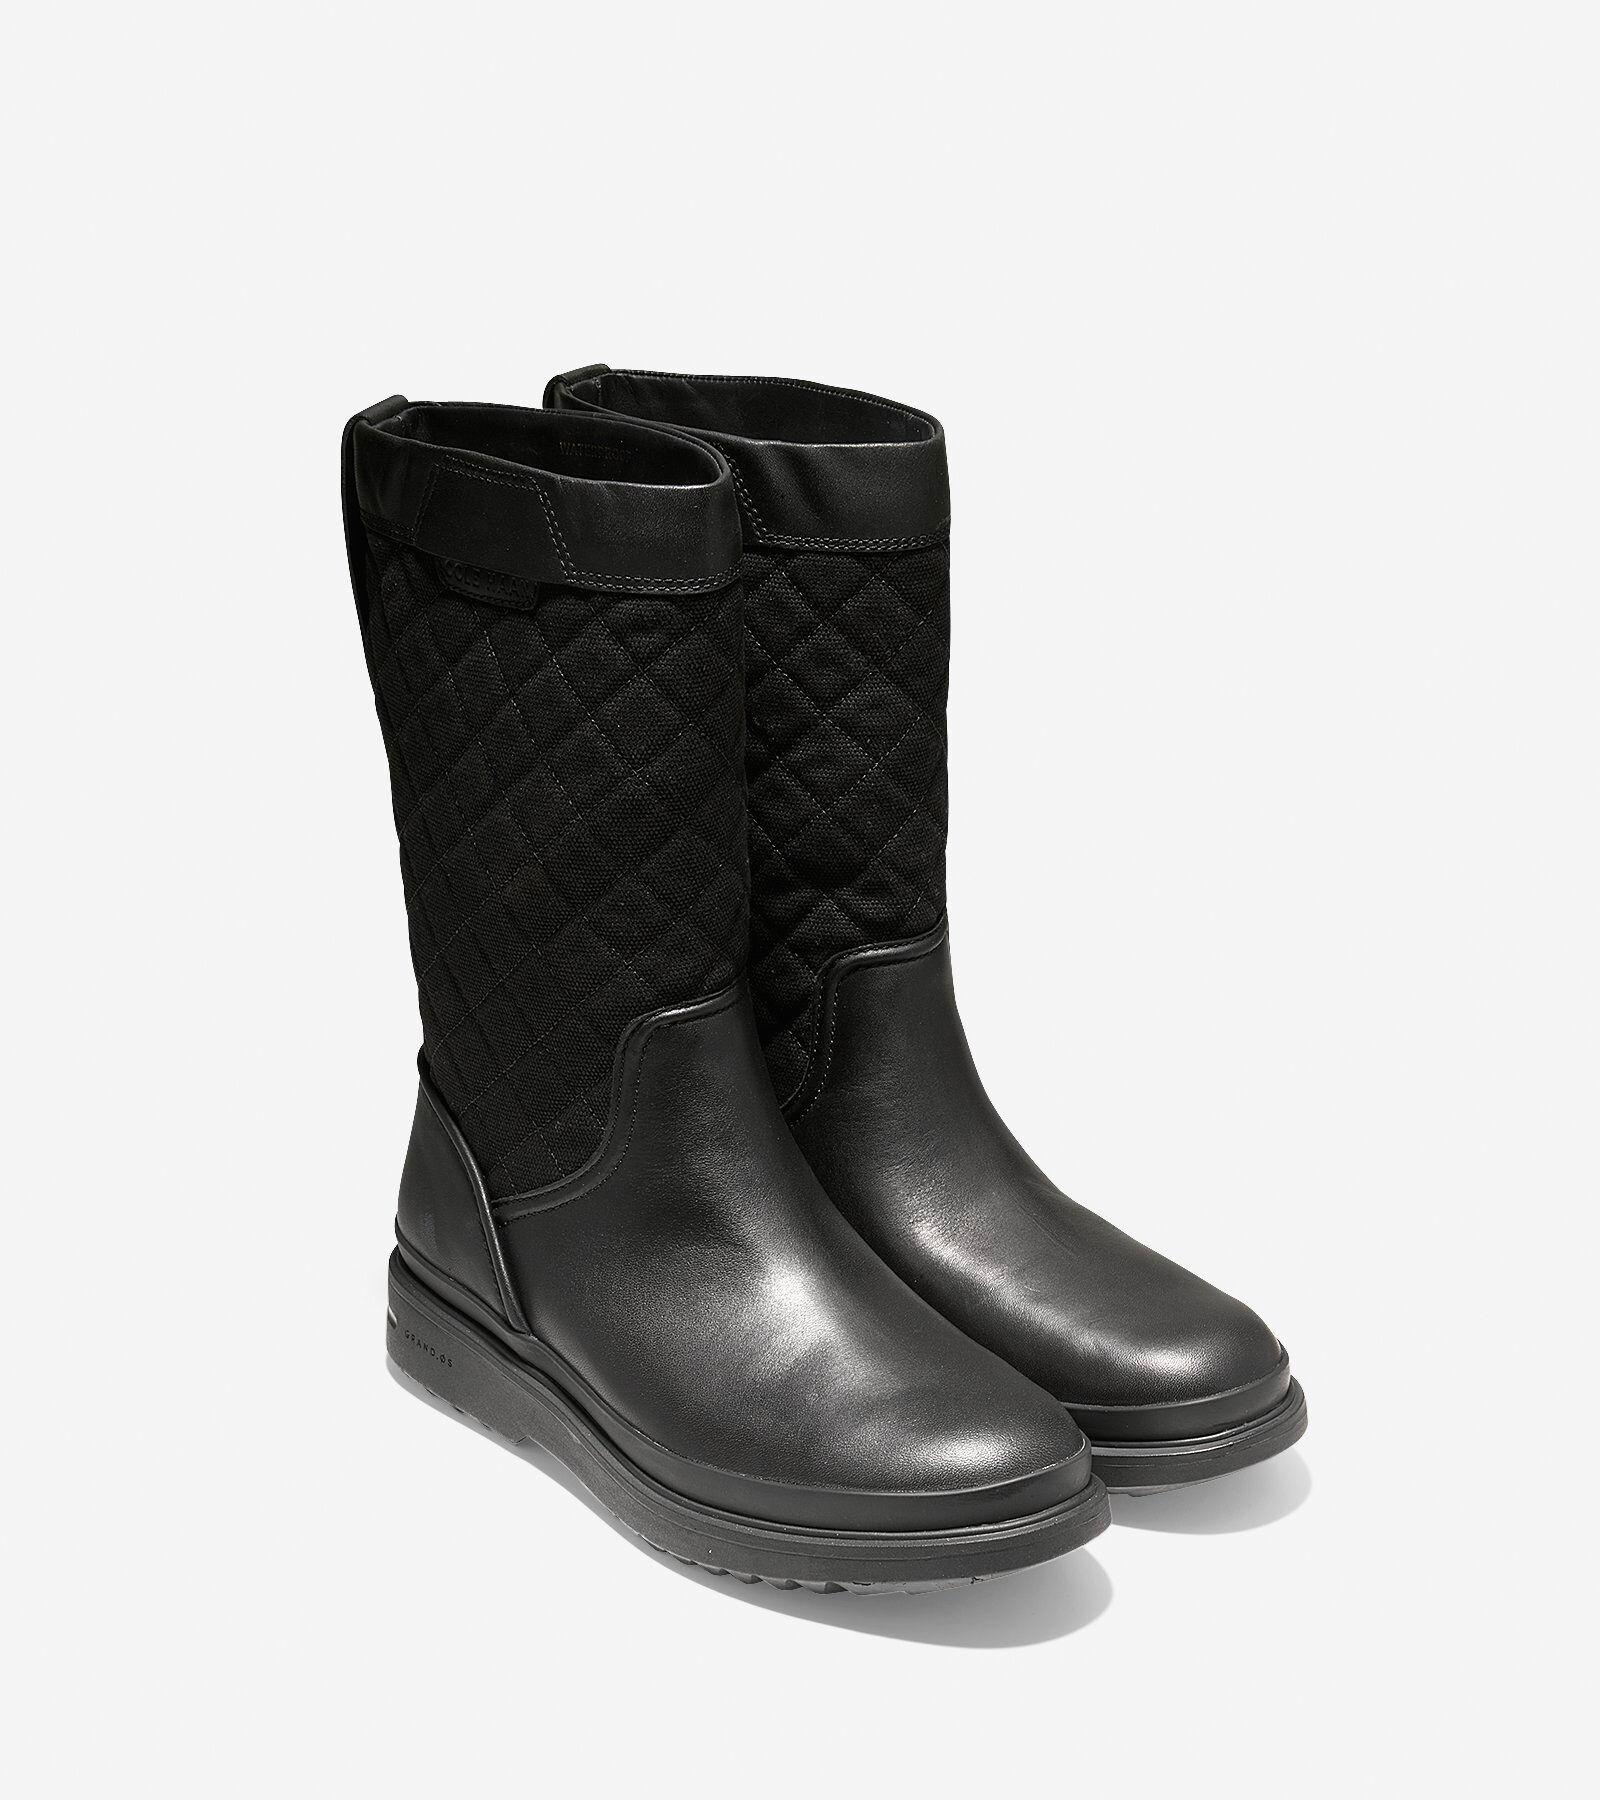 Millbridge Pull-On Boot Waterproof Cole Haan 2xYUVeZT